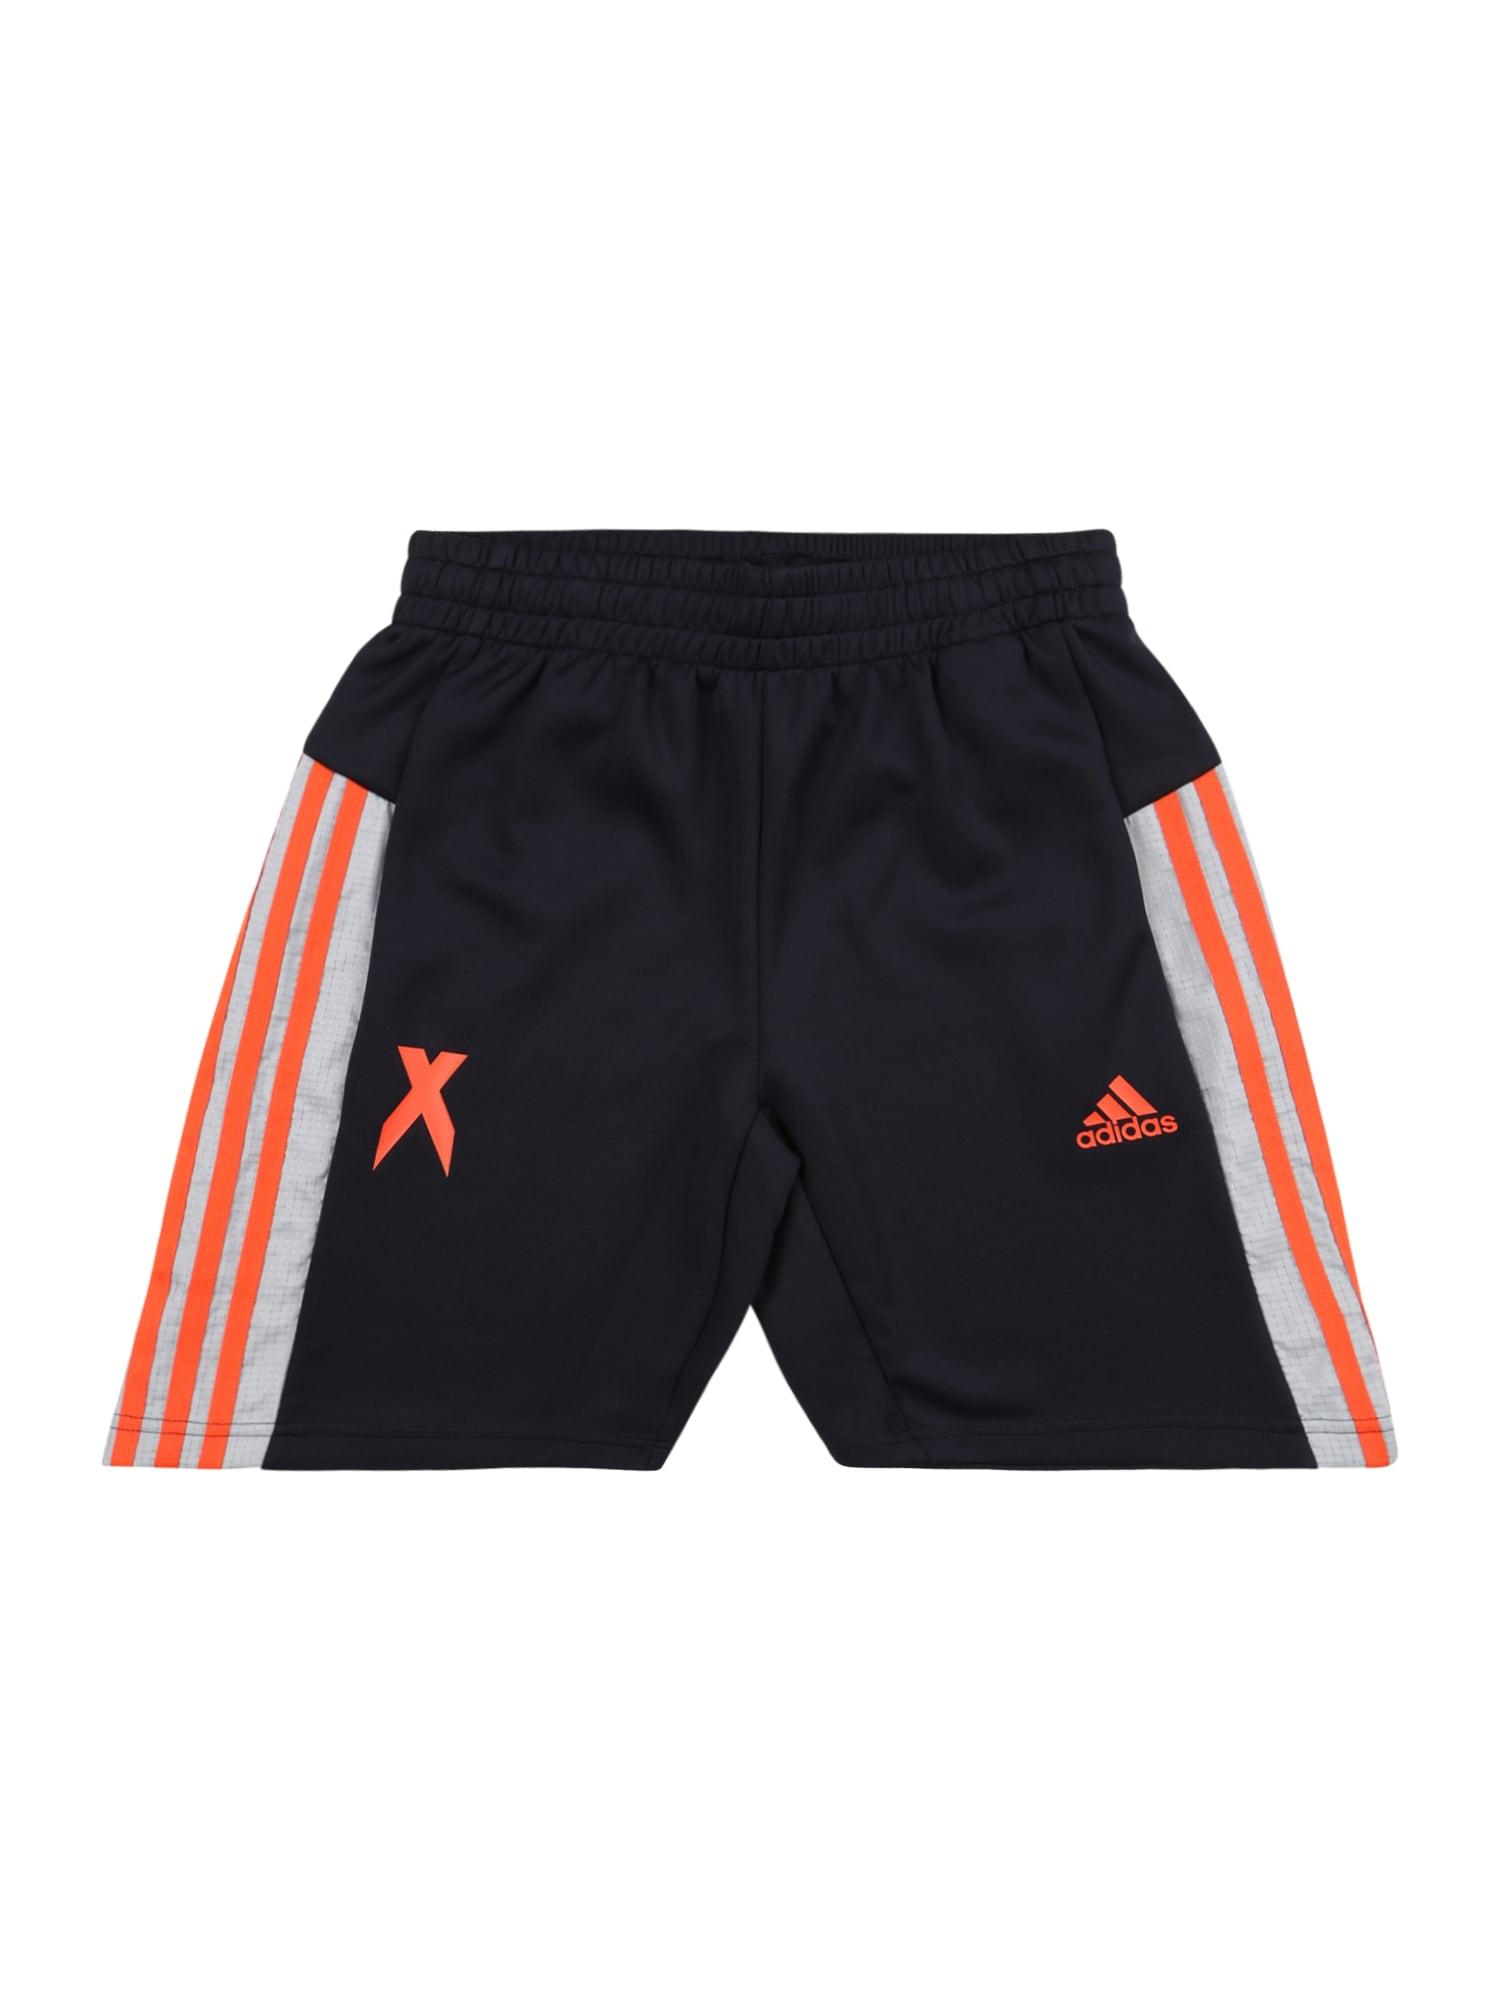 ADIDAS PERFORMANCE Športové nohavice  oranžová / šedobiela / modrá